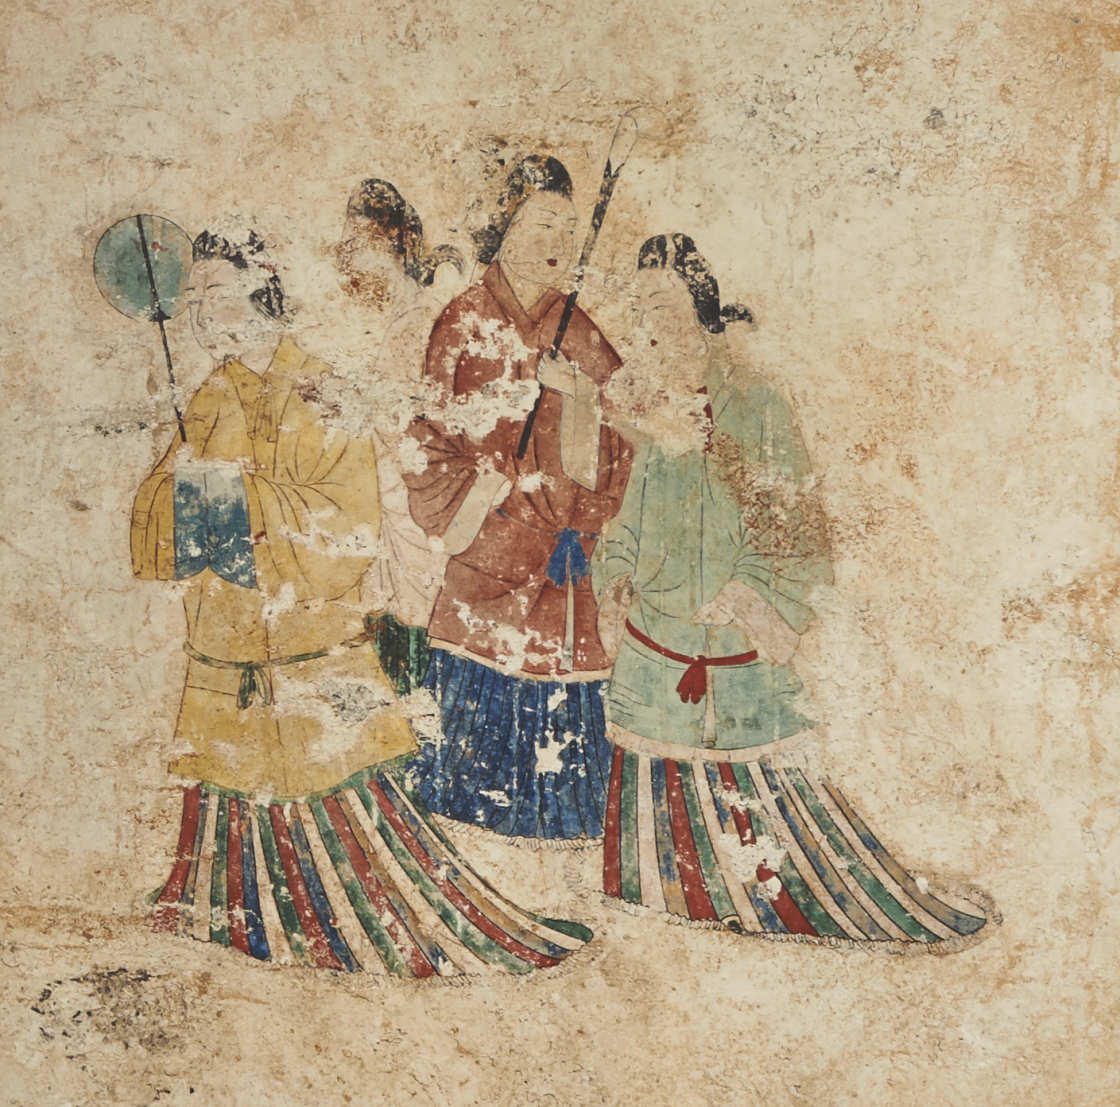 高松塚古墳壁画原寸大コロタイプ複元